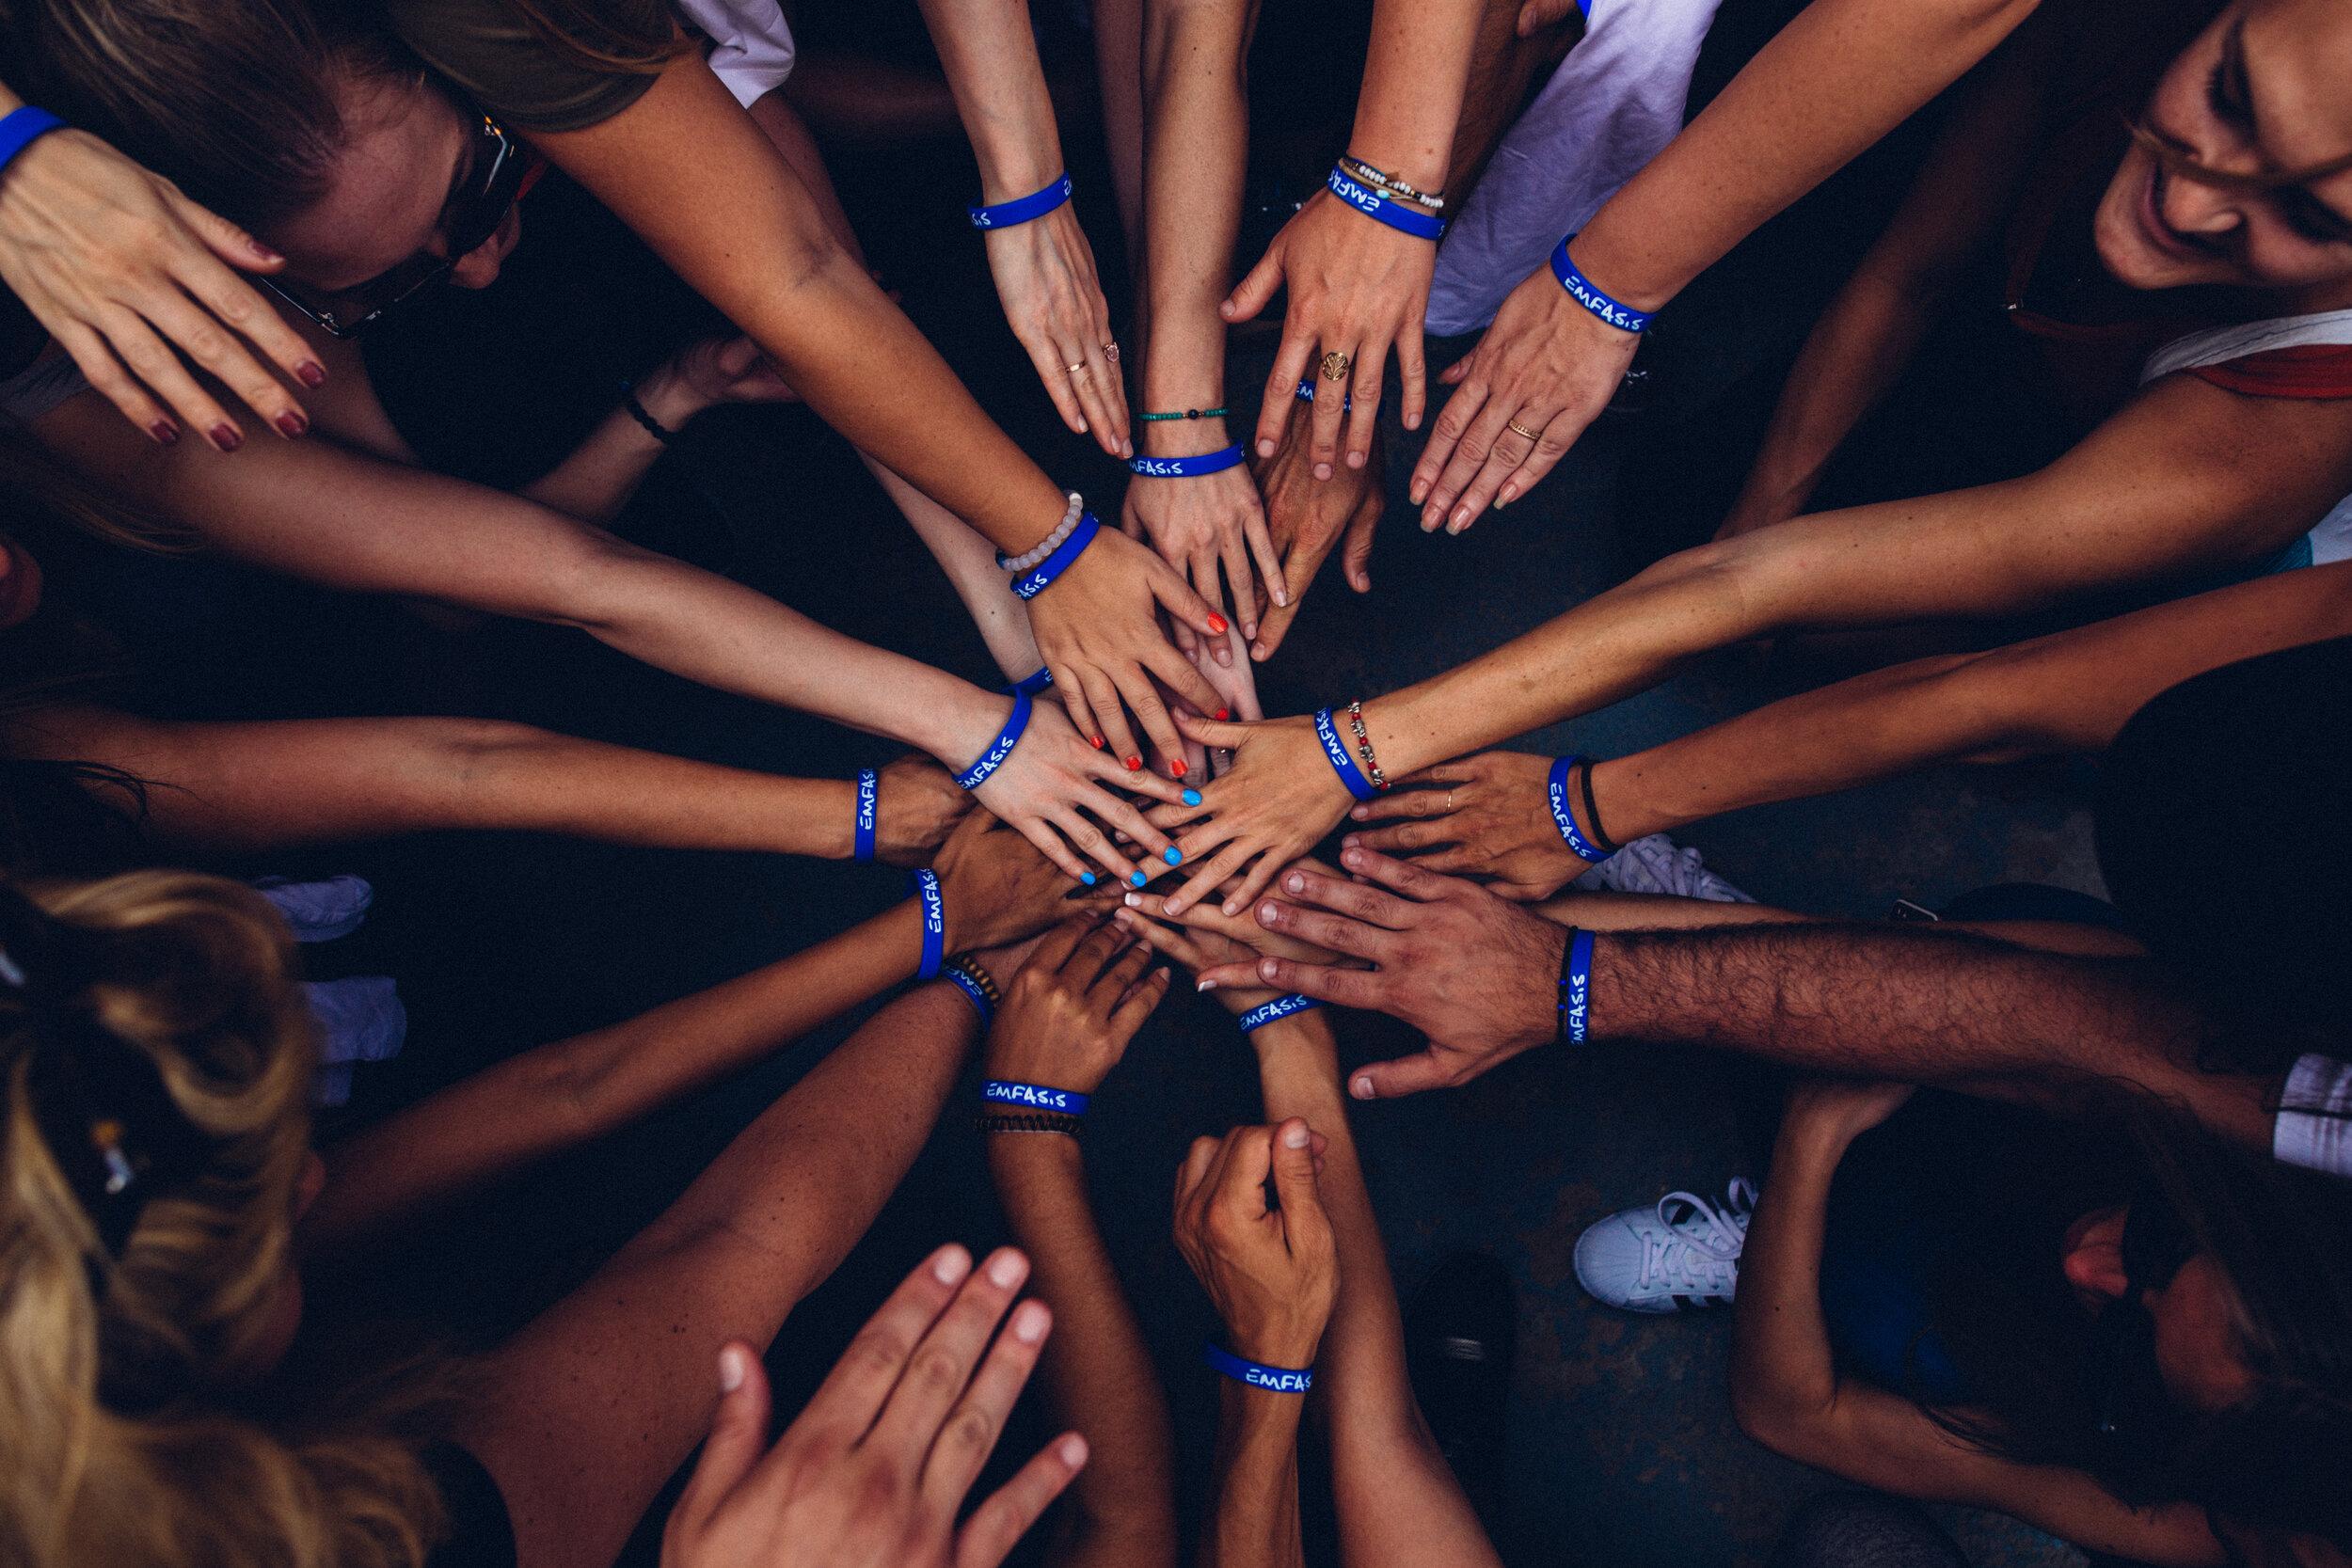 Organizational culture - Creating a Coaching CultureEmployee EngagementSuccession Planning & DevelopmentCoaching Training & MentoringChange Leadership